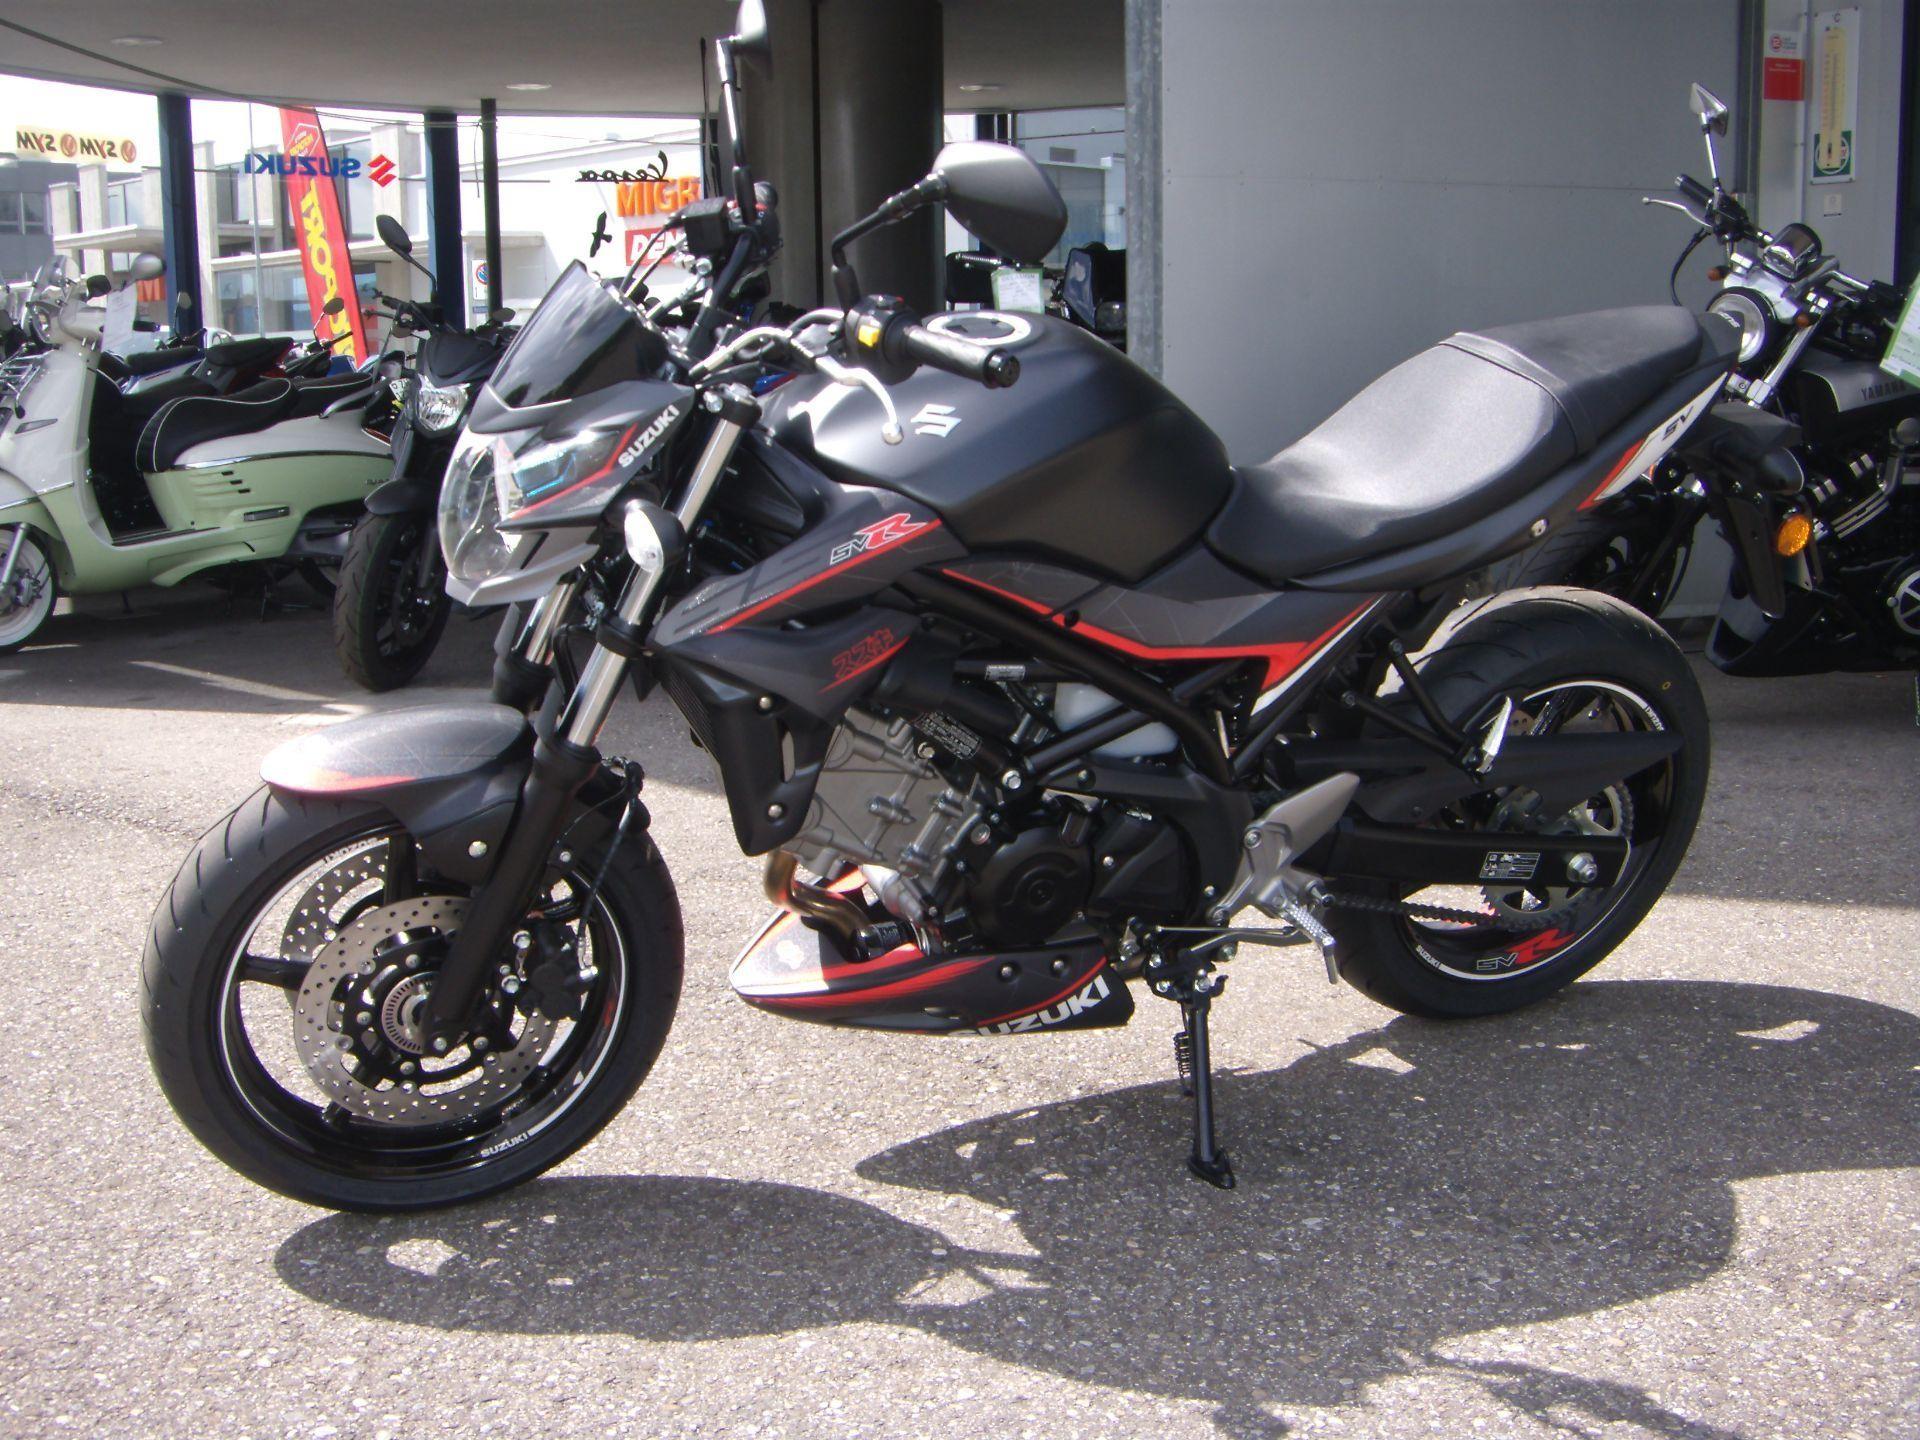 Motorrad Mieten & Roller Mieten SUZUKI SV 650 A ABS 35kW Sport Edition